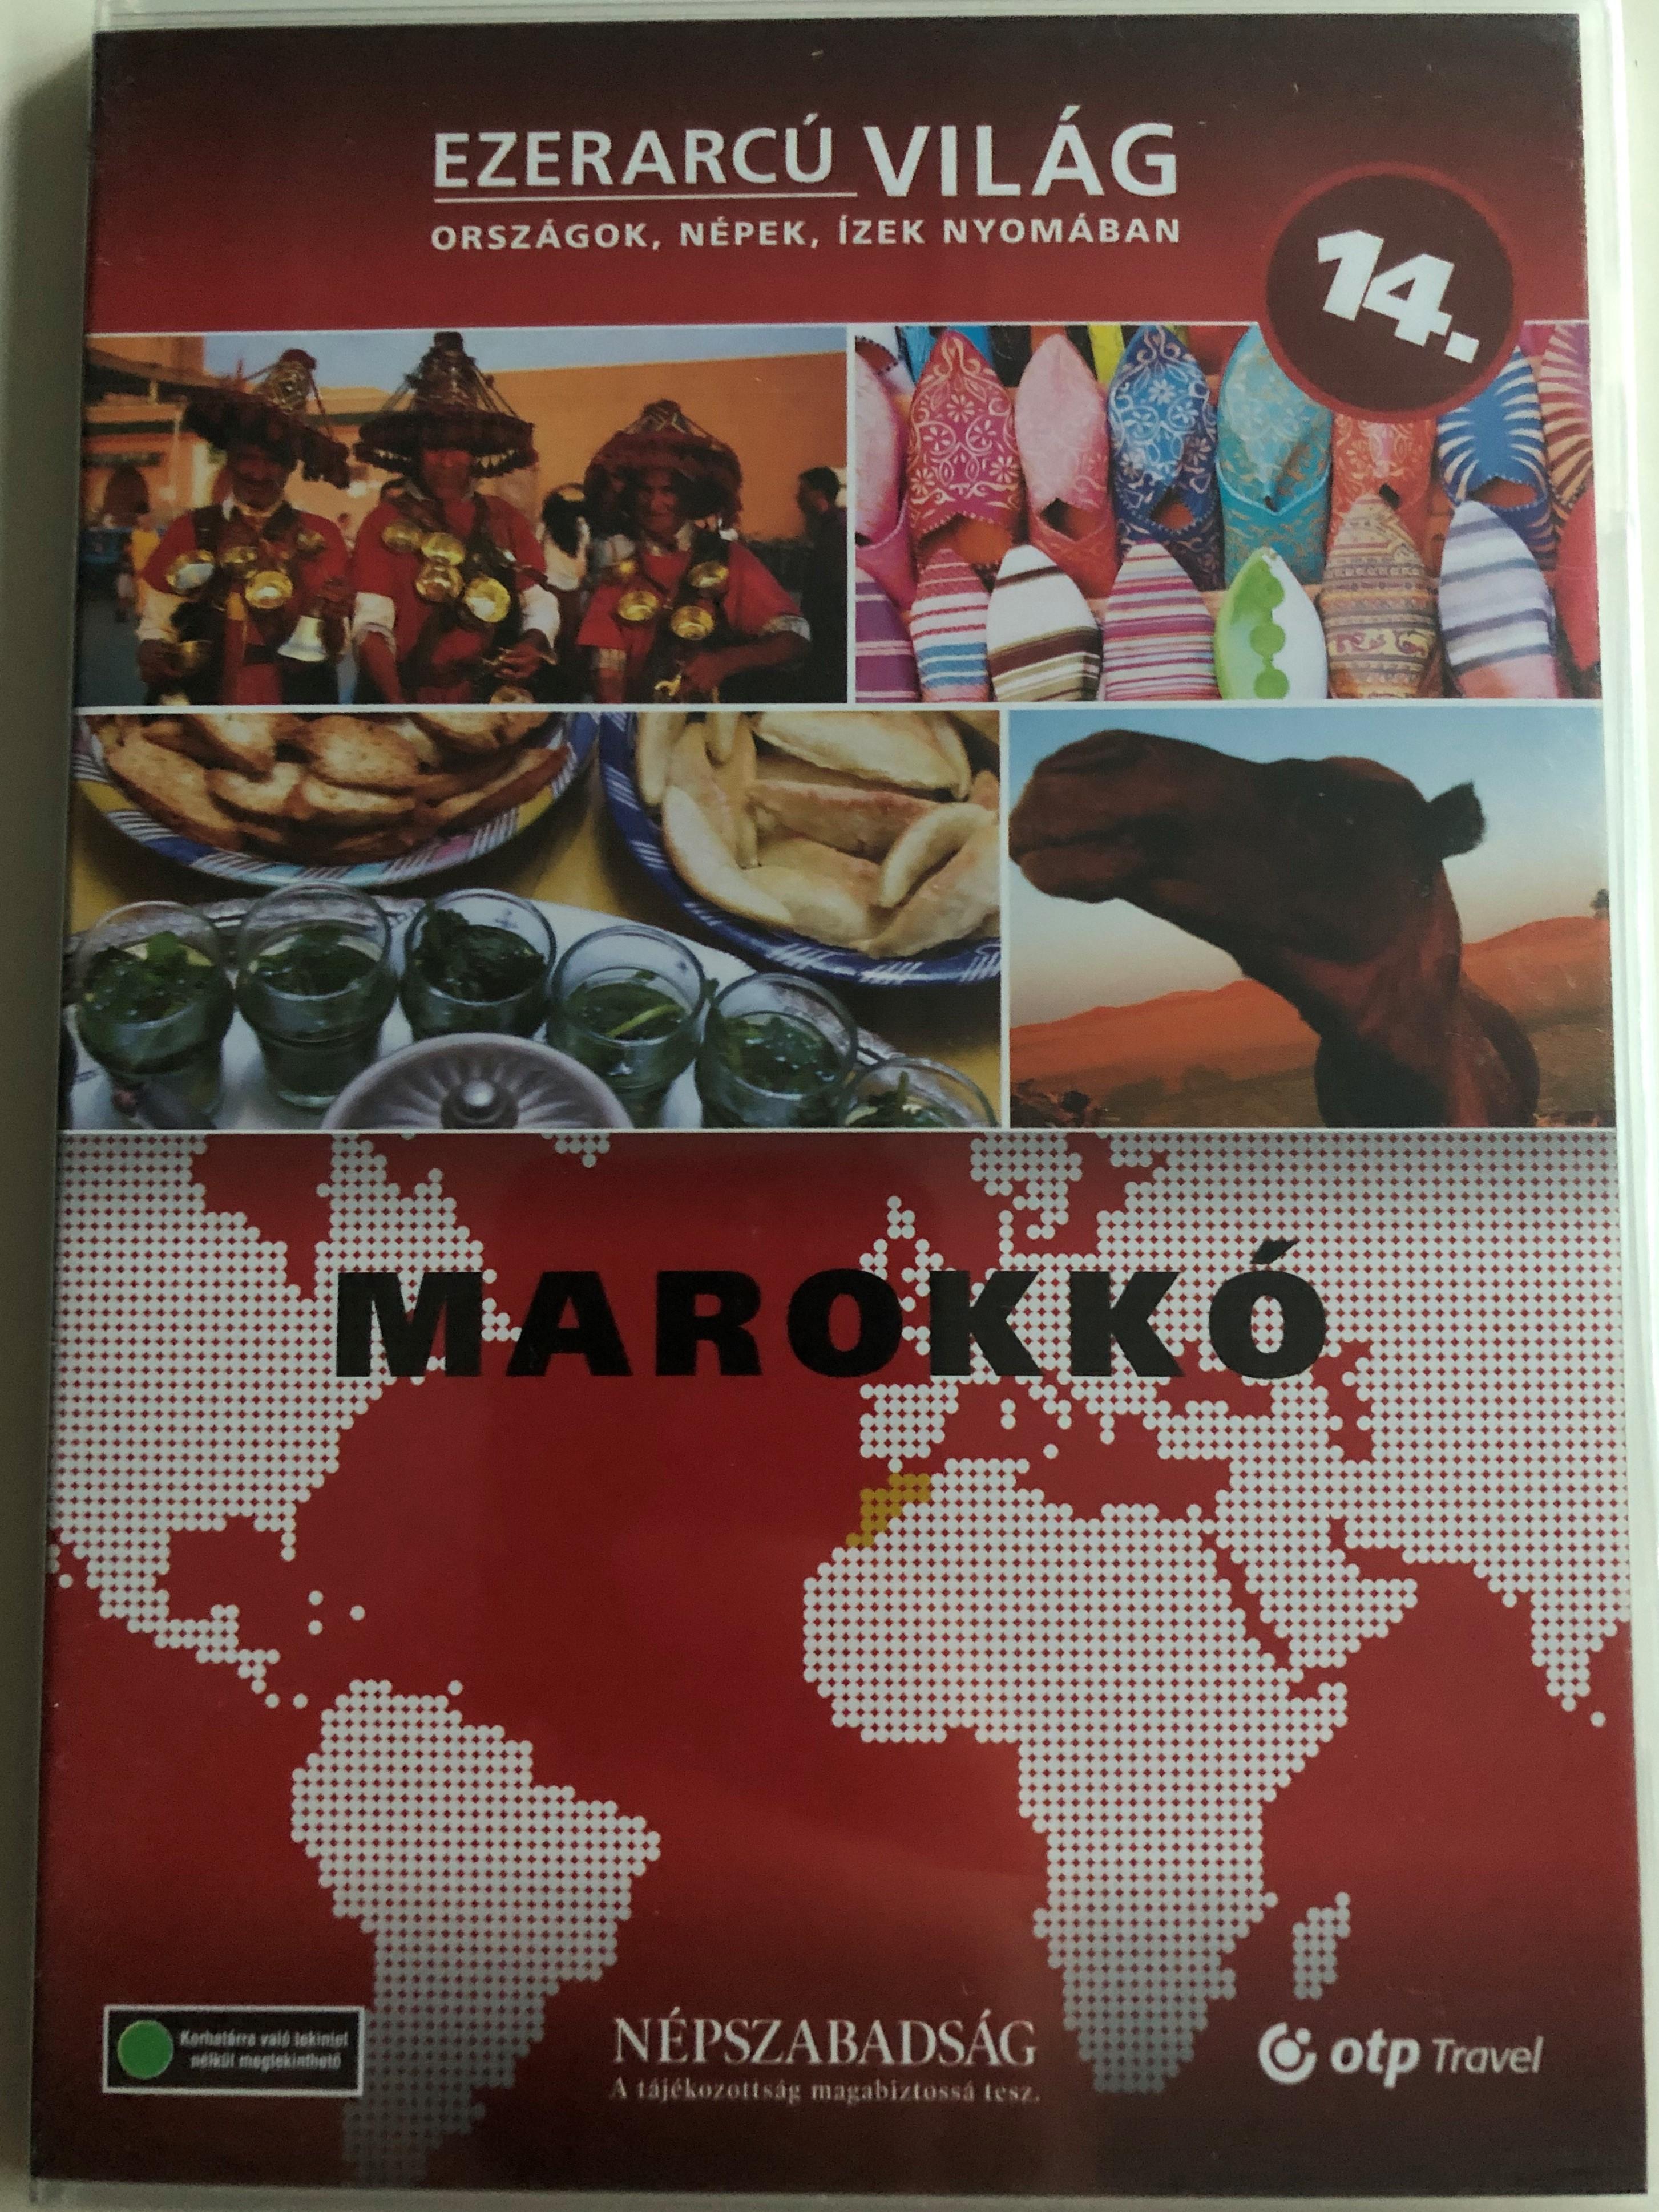 ezerarc-vil-g-vol.-14-marokk-morocco-dvd-2009-orsz-gok-n-pek-zek-nyom-ban-20-x-dvd-set-2009-n-pszabads-g-premier-media-pilot-film-documentary-series-about-our-world-1-.jpg